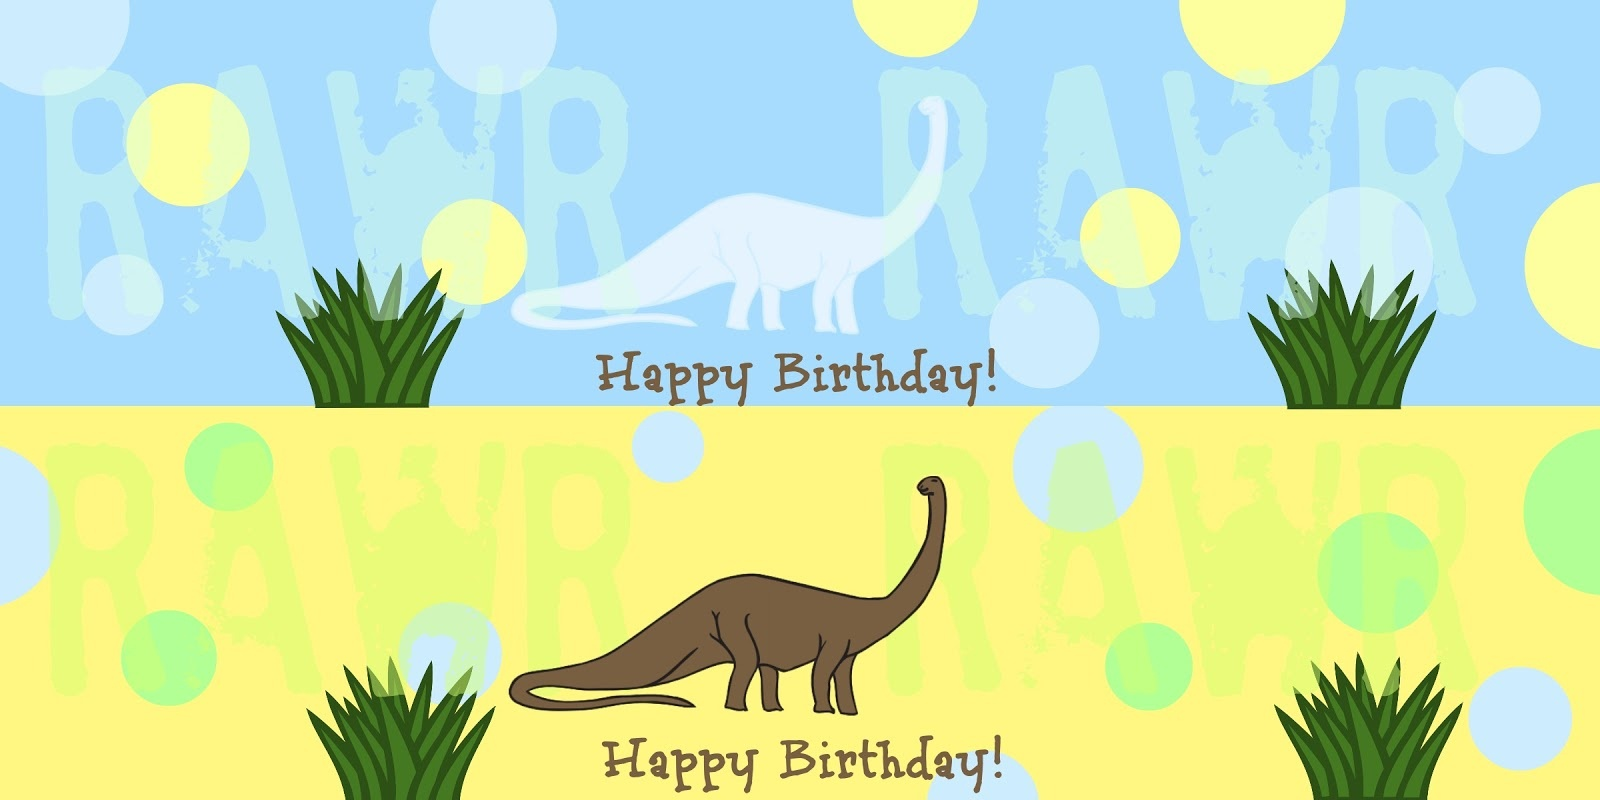 Party With Dinosaurs - Dinosaur Themed Birthday Party - Free Printable Dinosaur Birthday Invitations